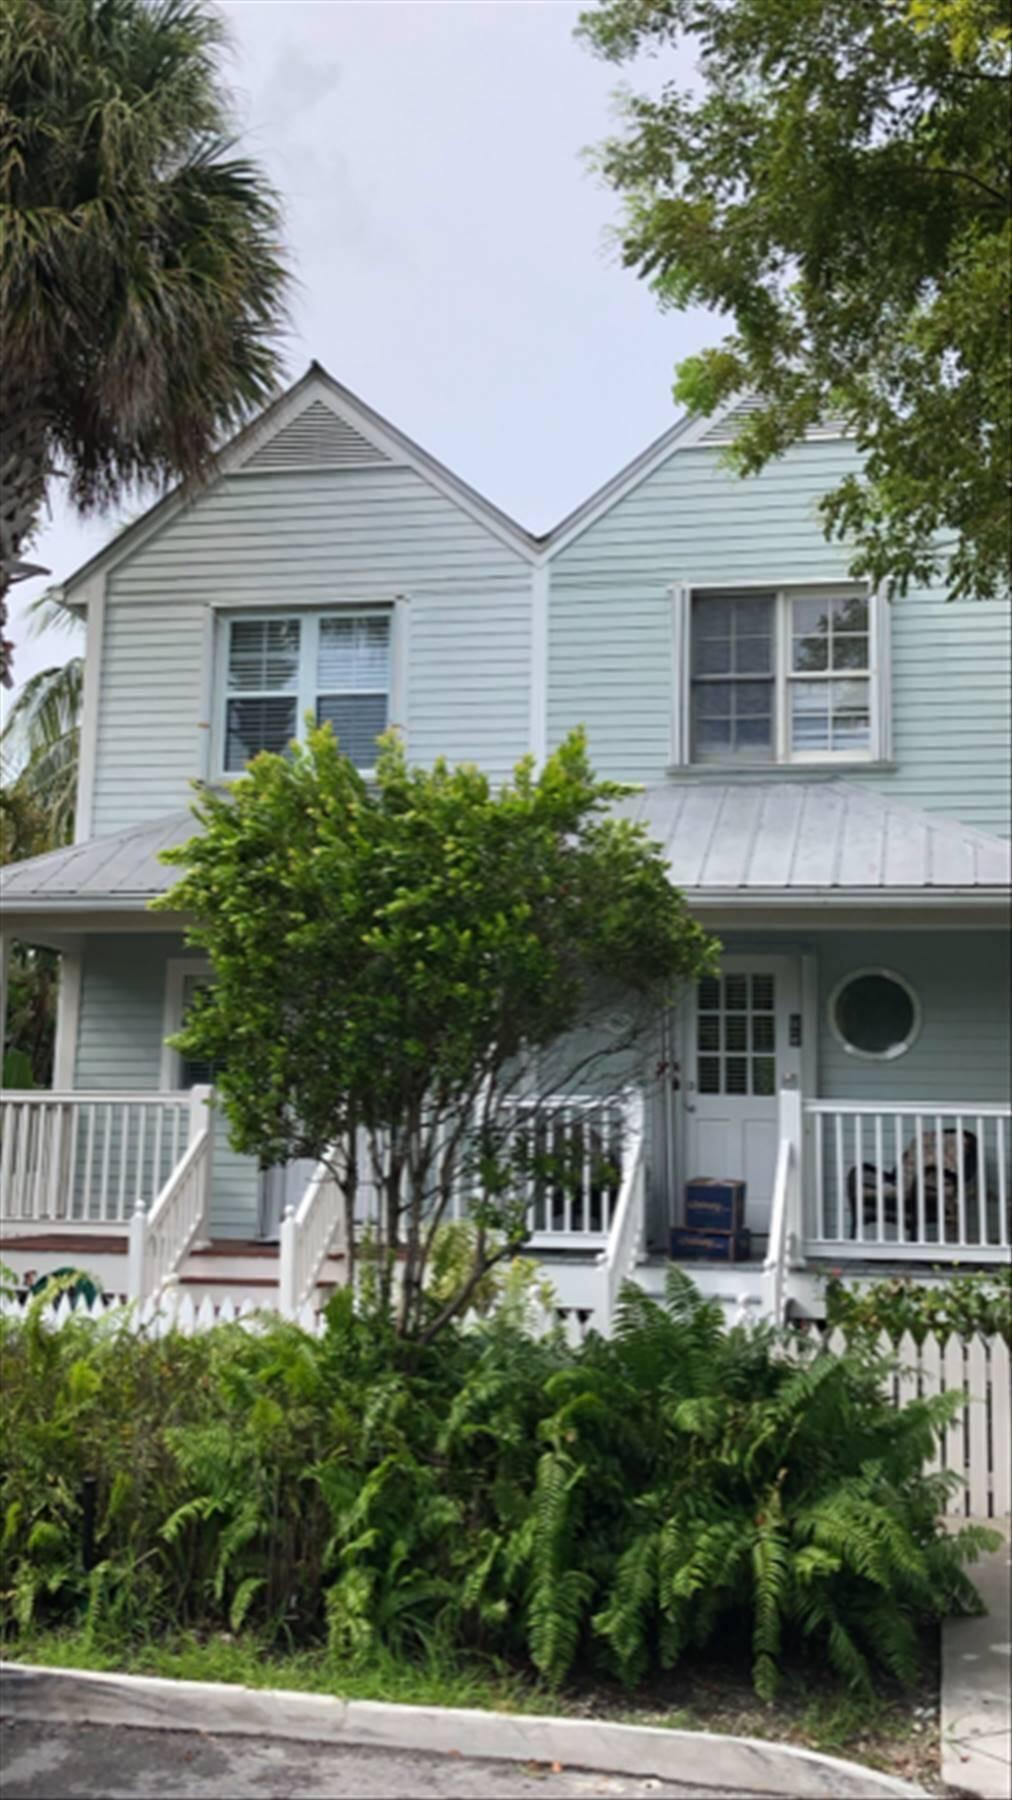 58 Merganser Lane, Key West, FL 33040 - #: 595902